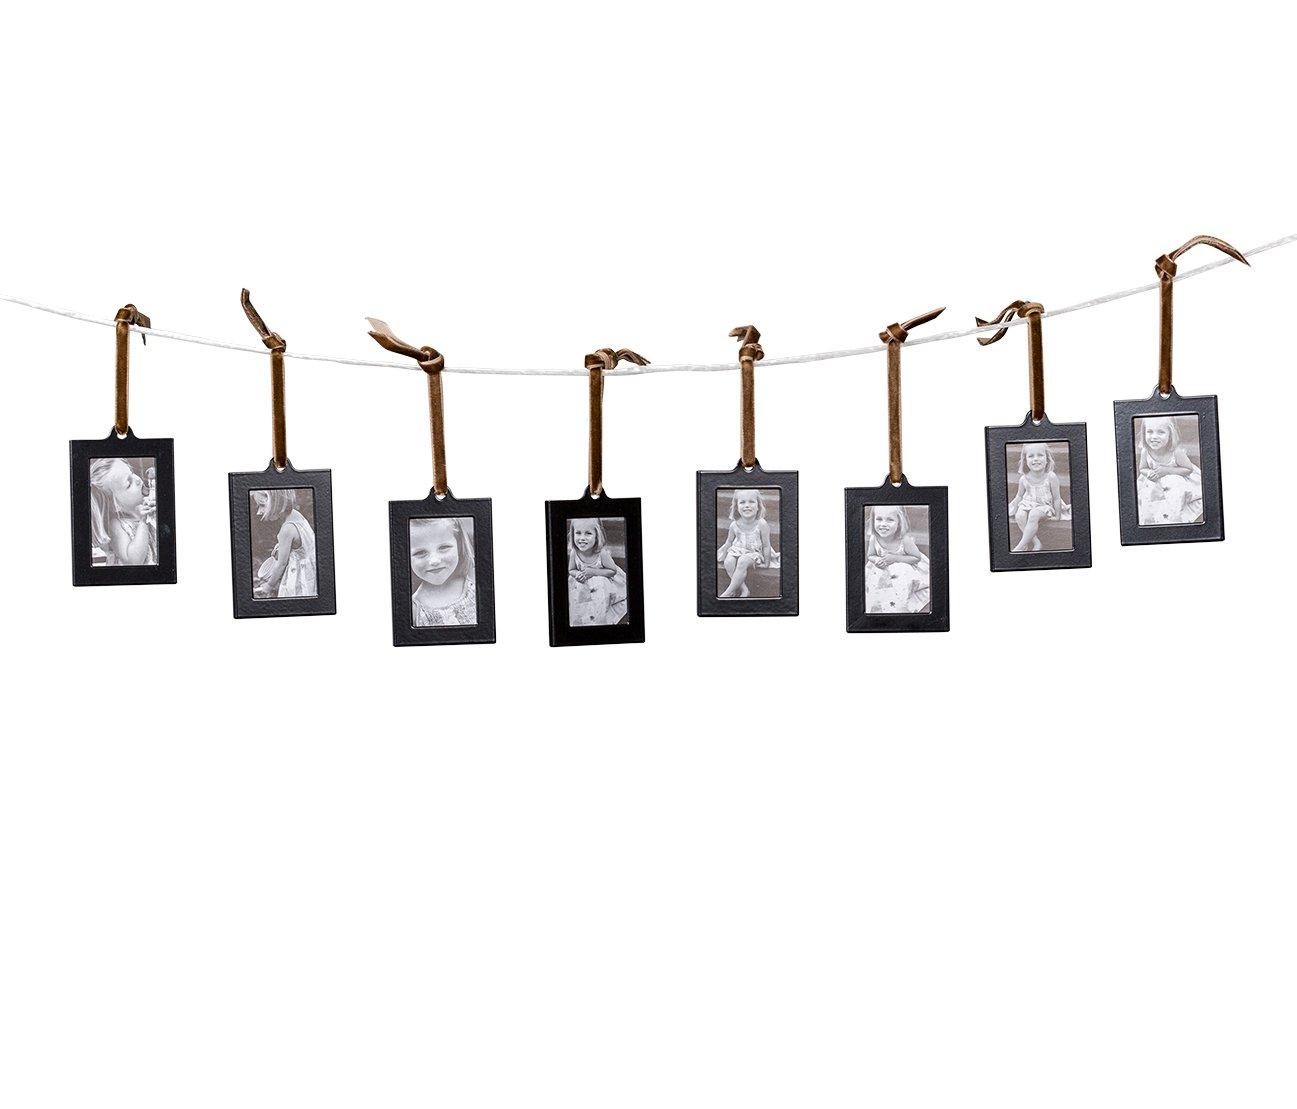 Klikel Hanging Picture Frame Ornaments, Set of 8 by Klikel